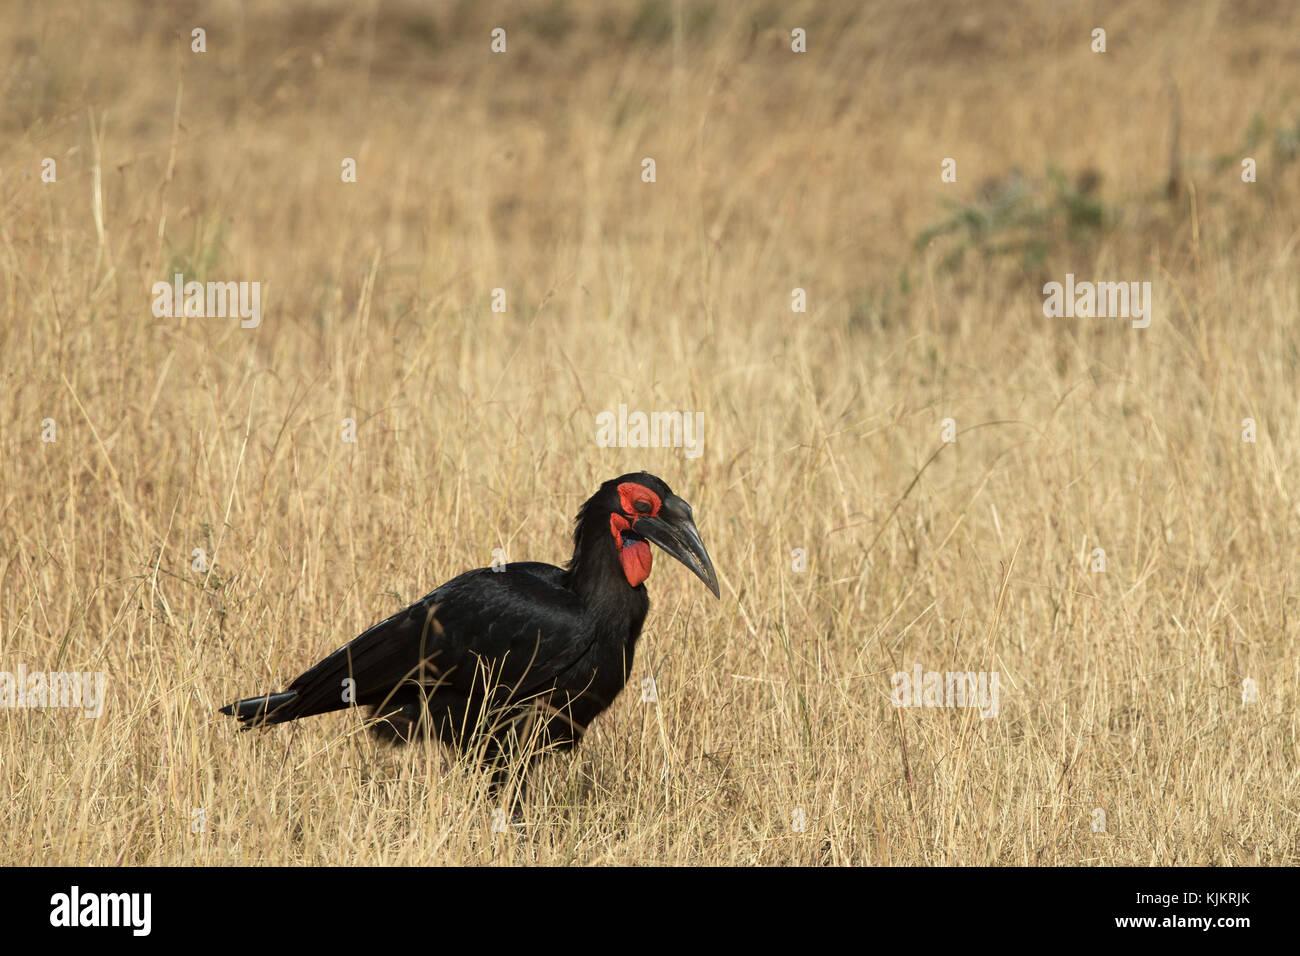 Serengeti National Park. Southern ground hornbill (Bucorvus leadbeateri) .  Tanzania. - Stock Image